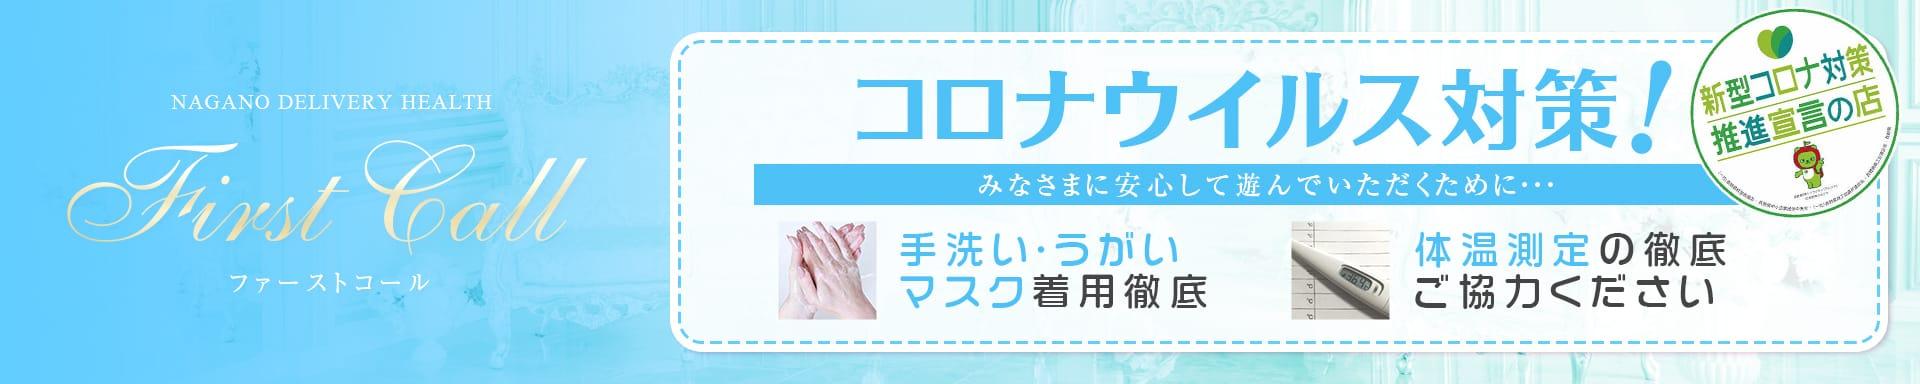 firstcall~ファーストコール~ その3